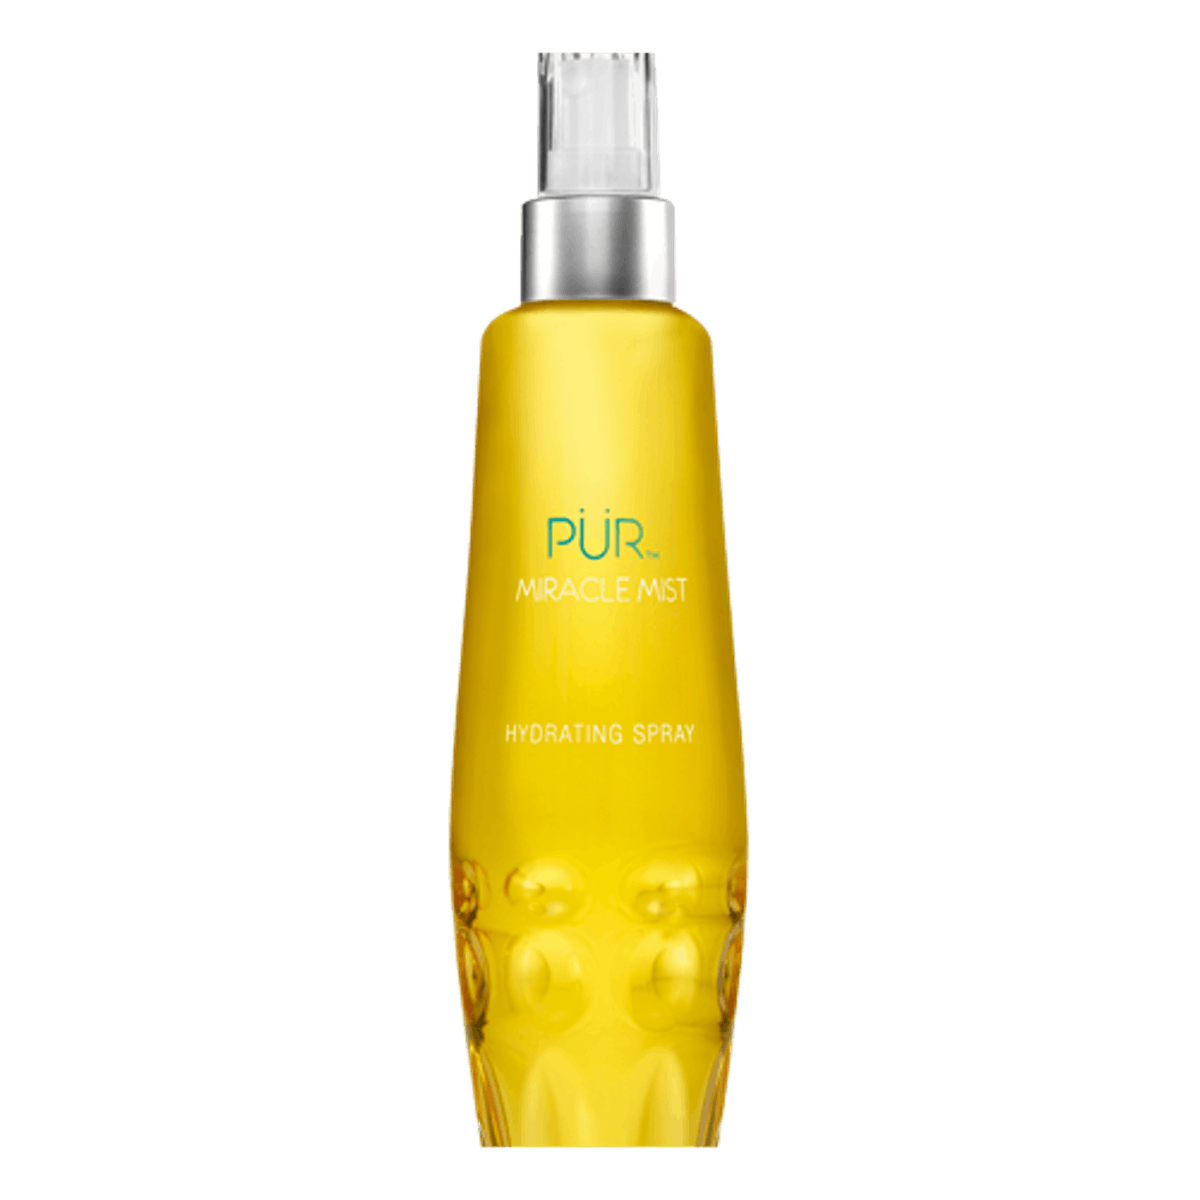 PÜR Miracle Mist Hydrating Spray